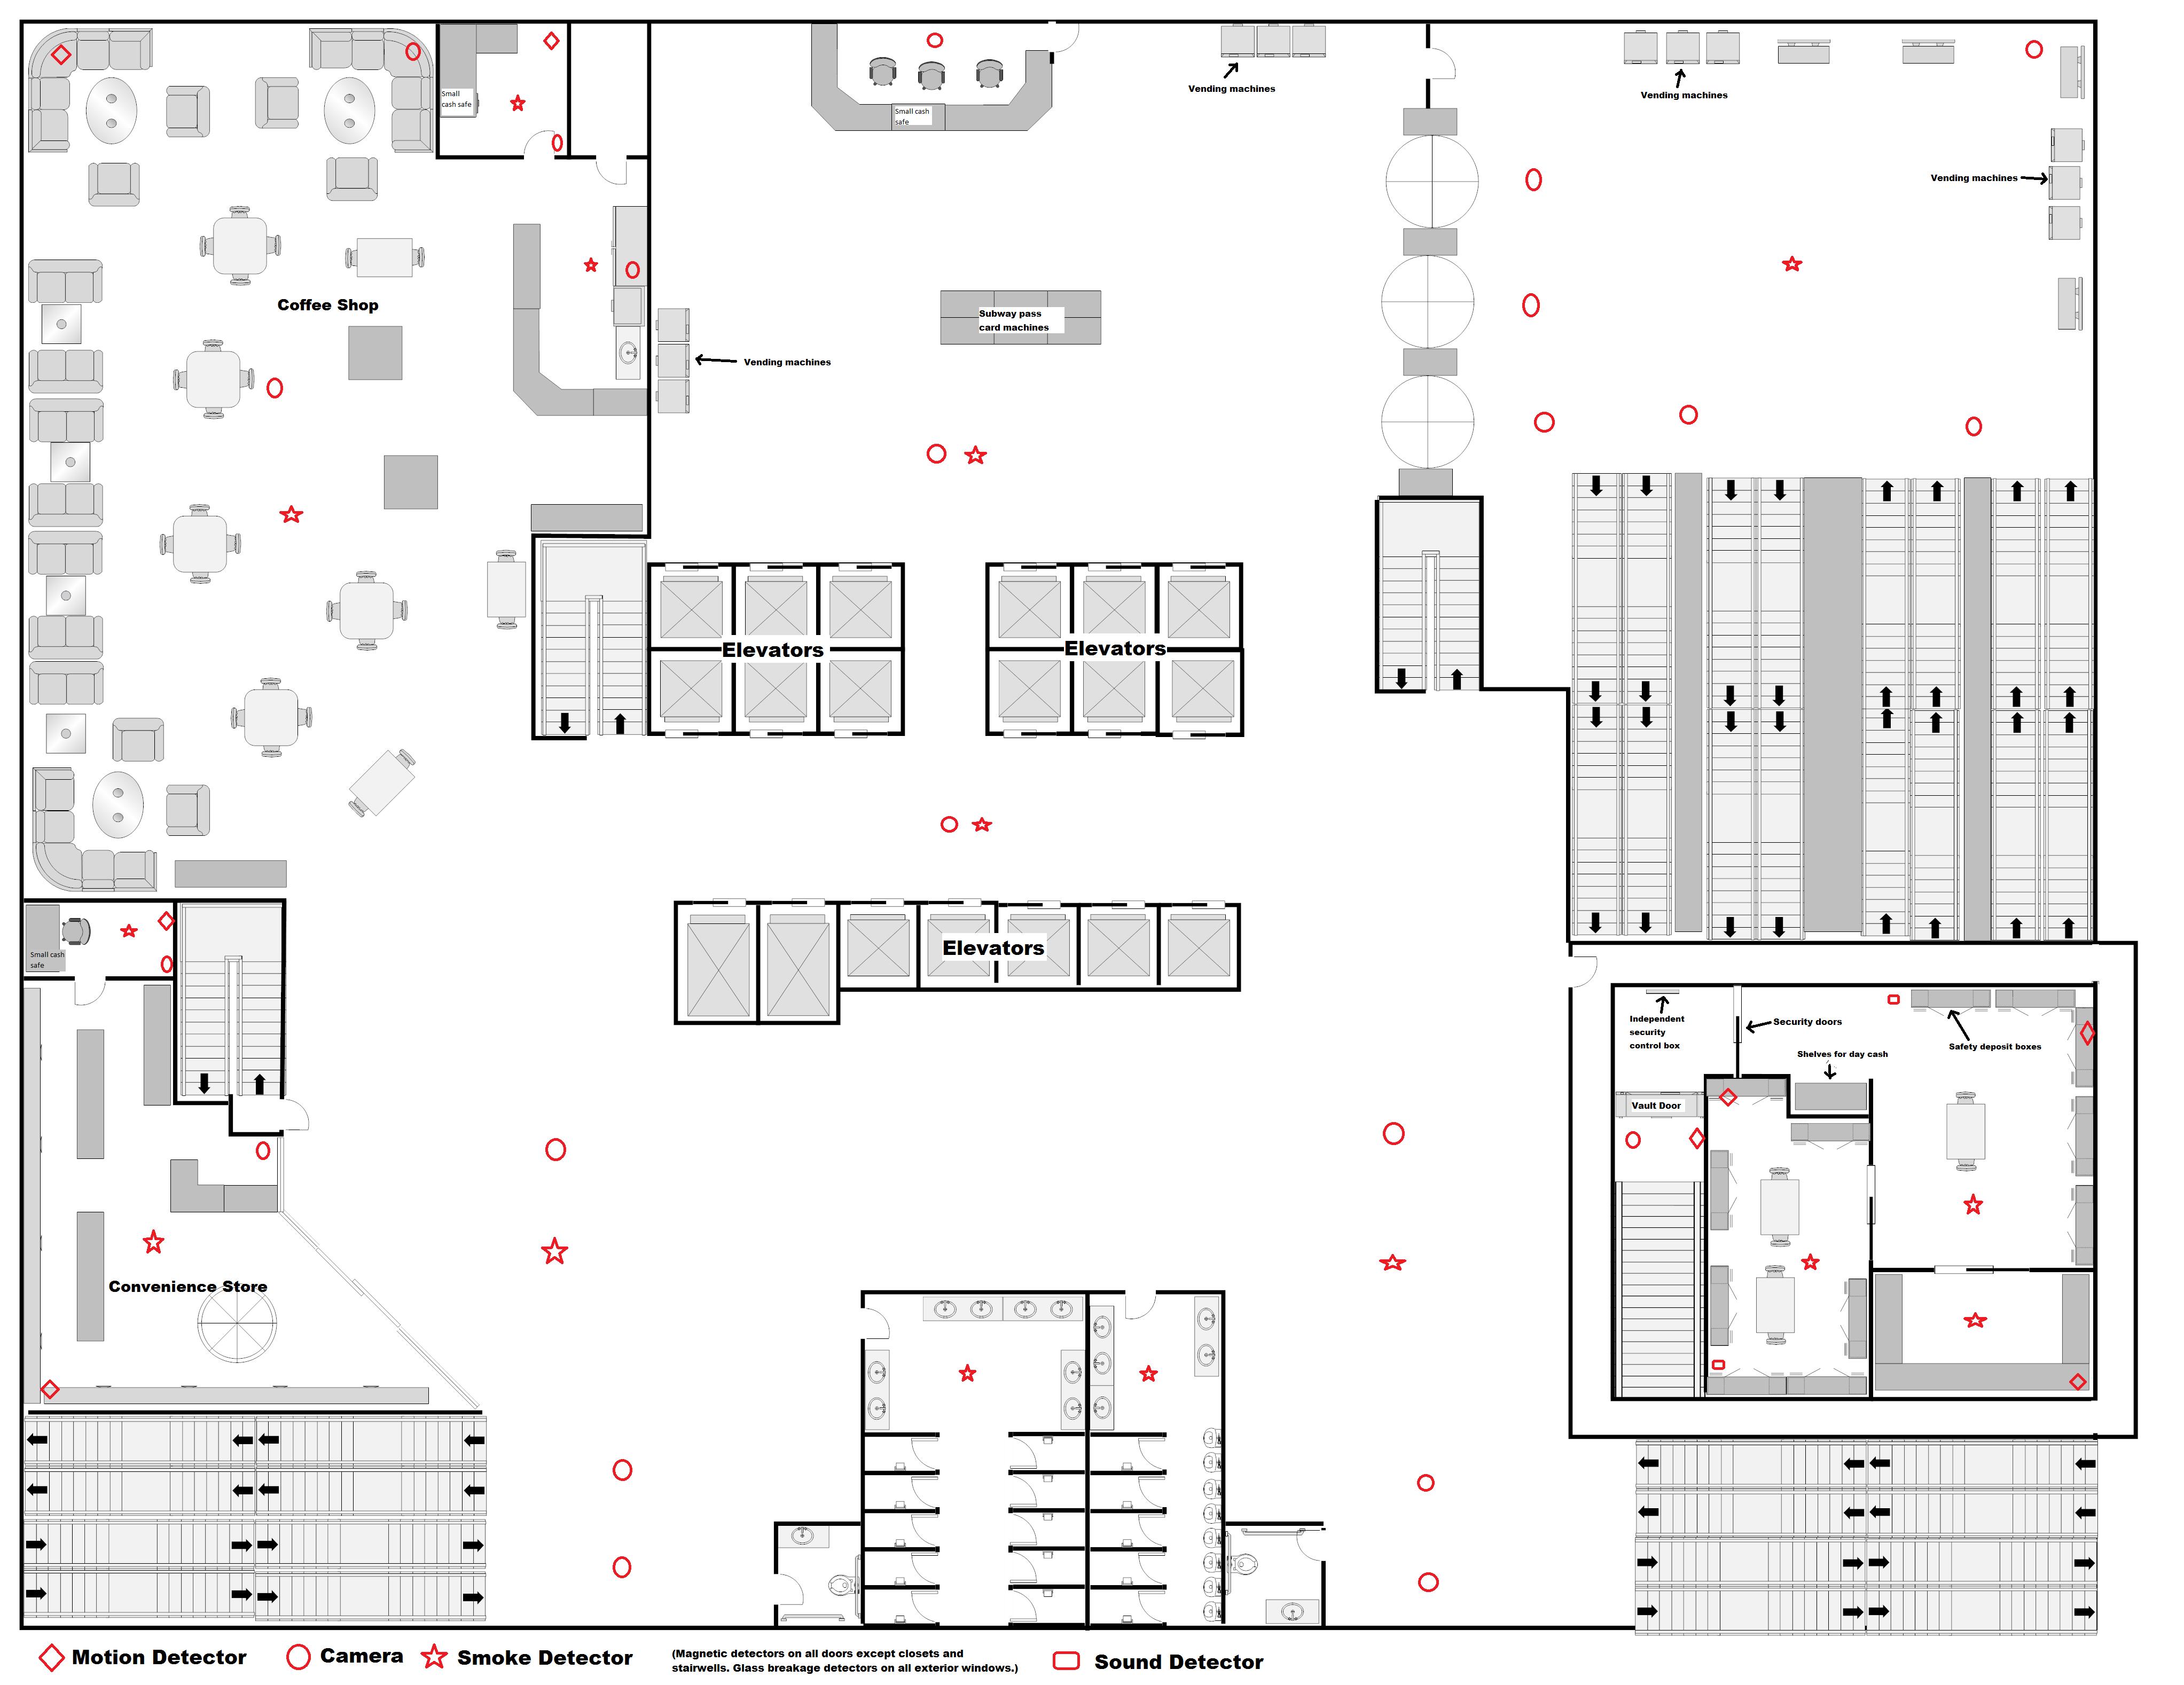 Image result for a safe deposit box bank room floor plan floor plans flooring